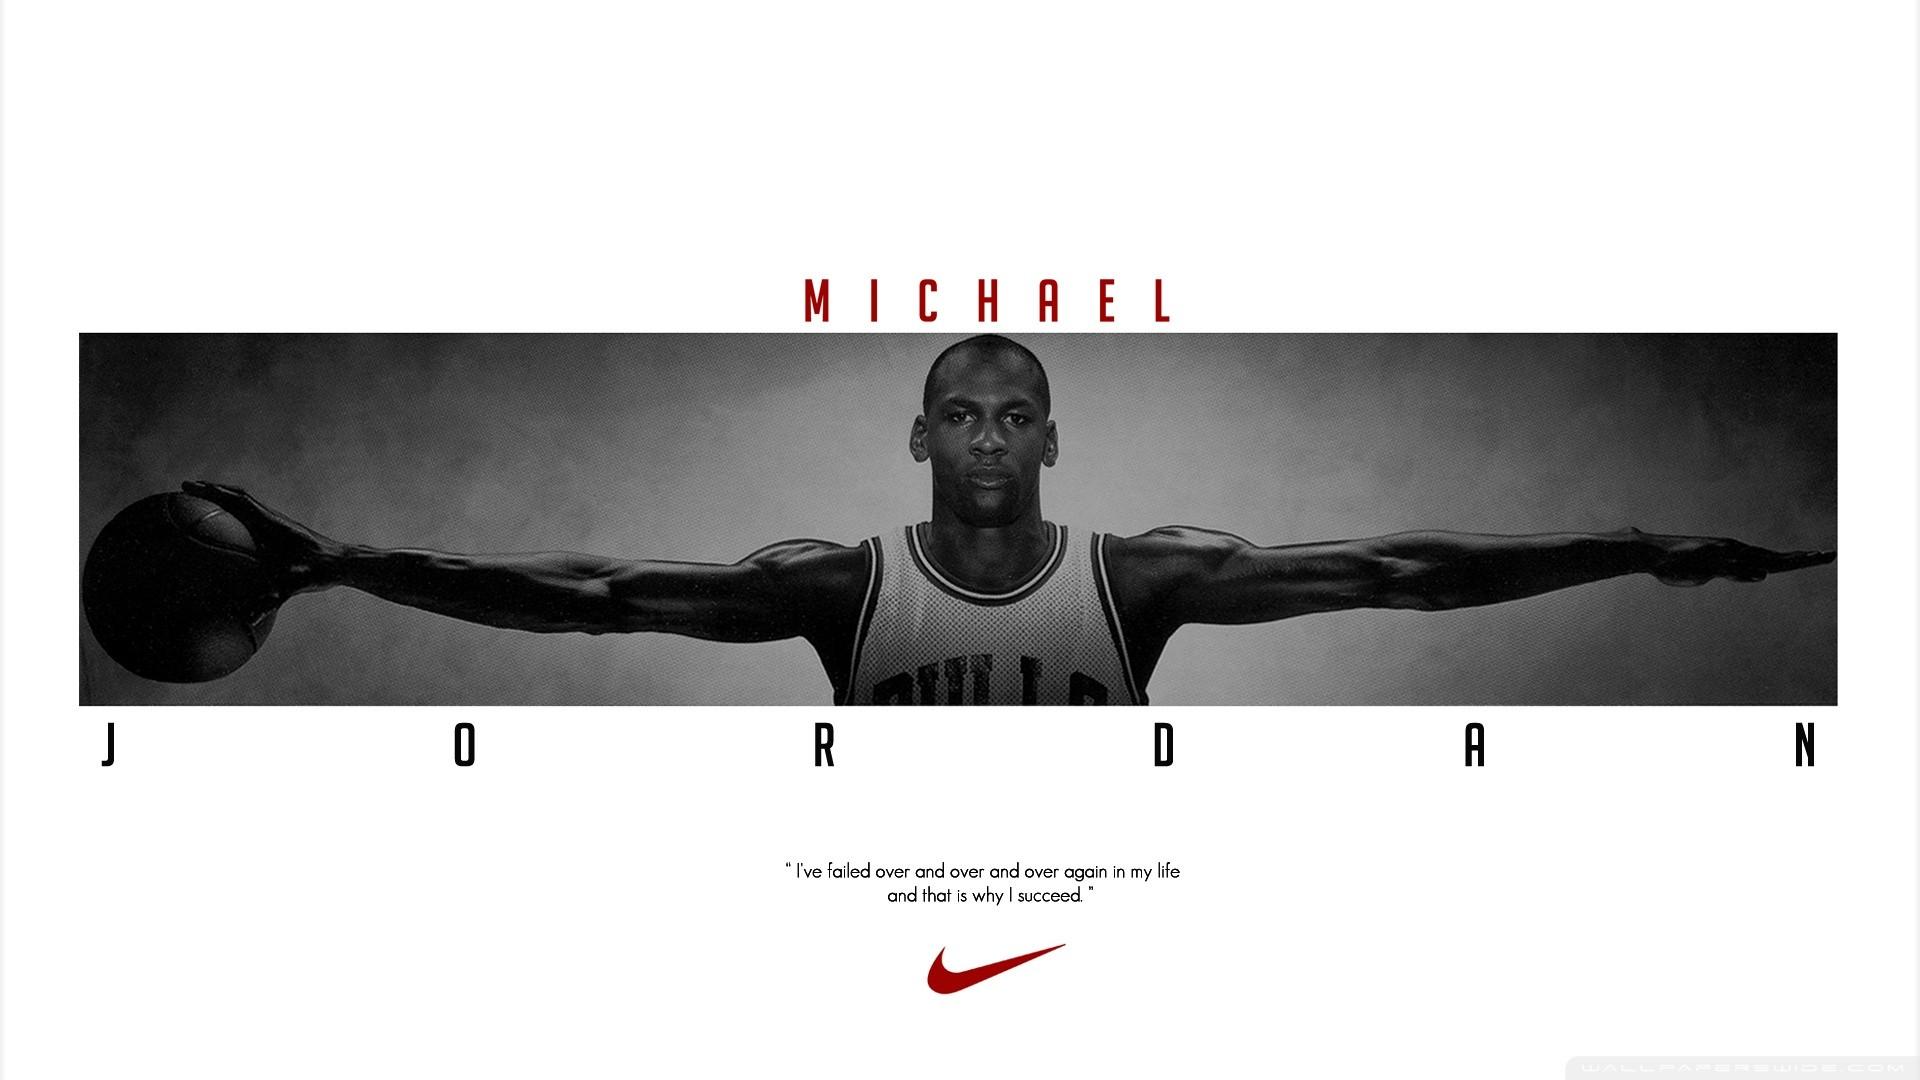 Michael Jordan Nike Wallpaper: デスクトップ壁紙 : ナイキ, テキスト, バスケットボール, ブランド, シカゴ・ブルズ, マイケルジョーダン